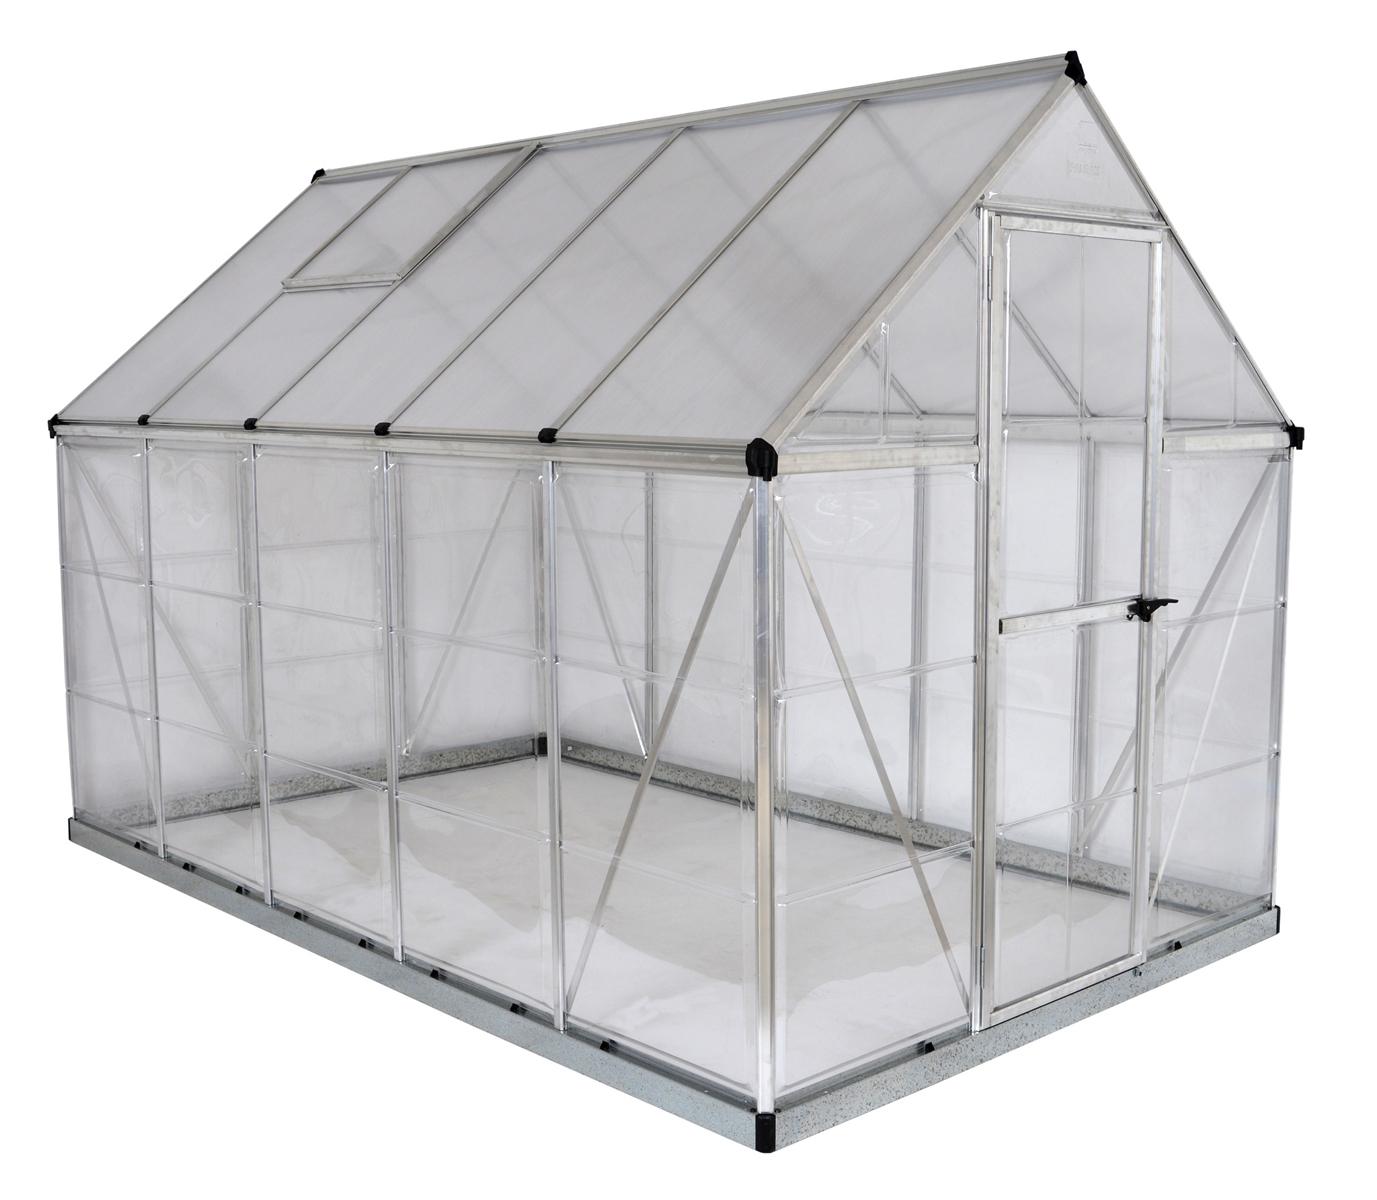 Hybrid 6' x 10' Greenhouse - Silver